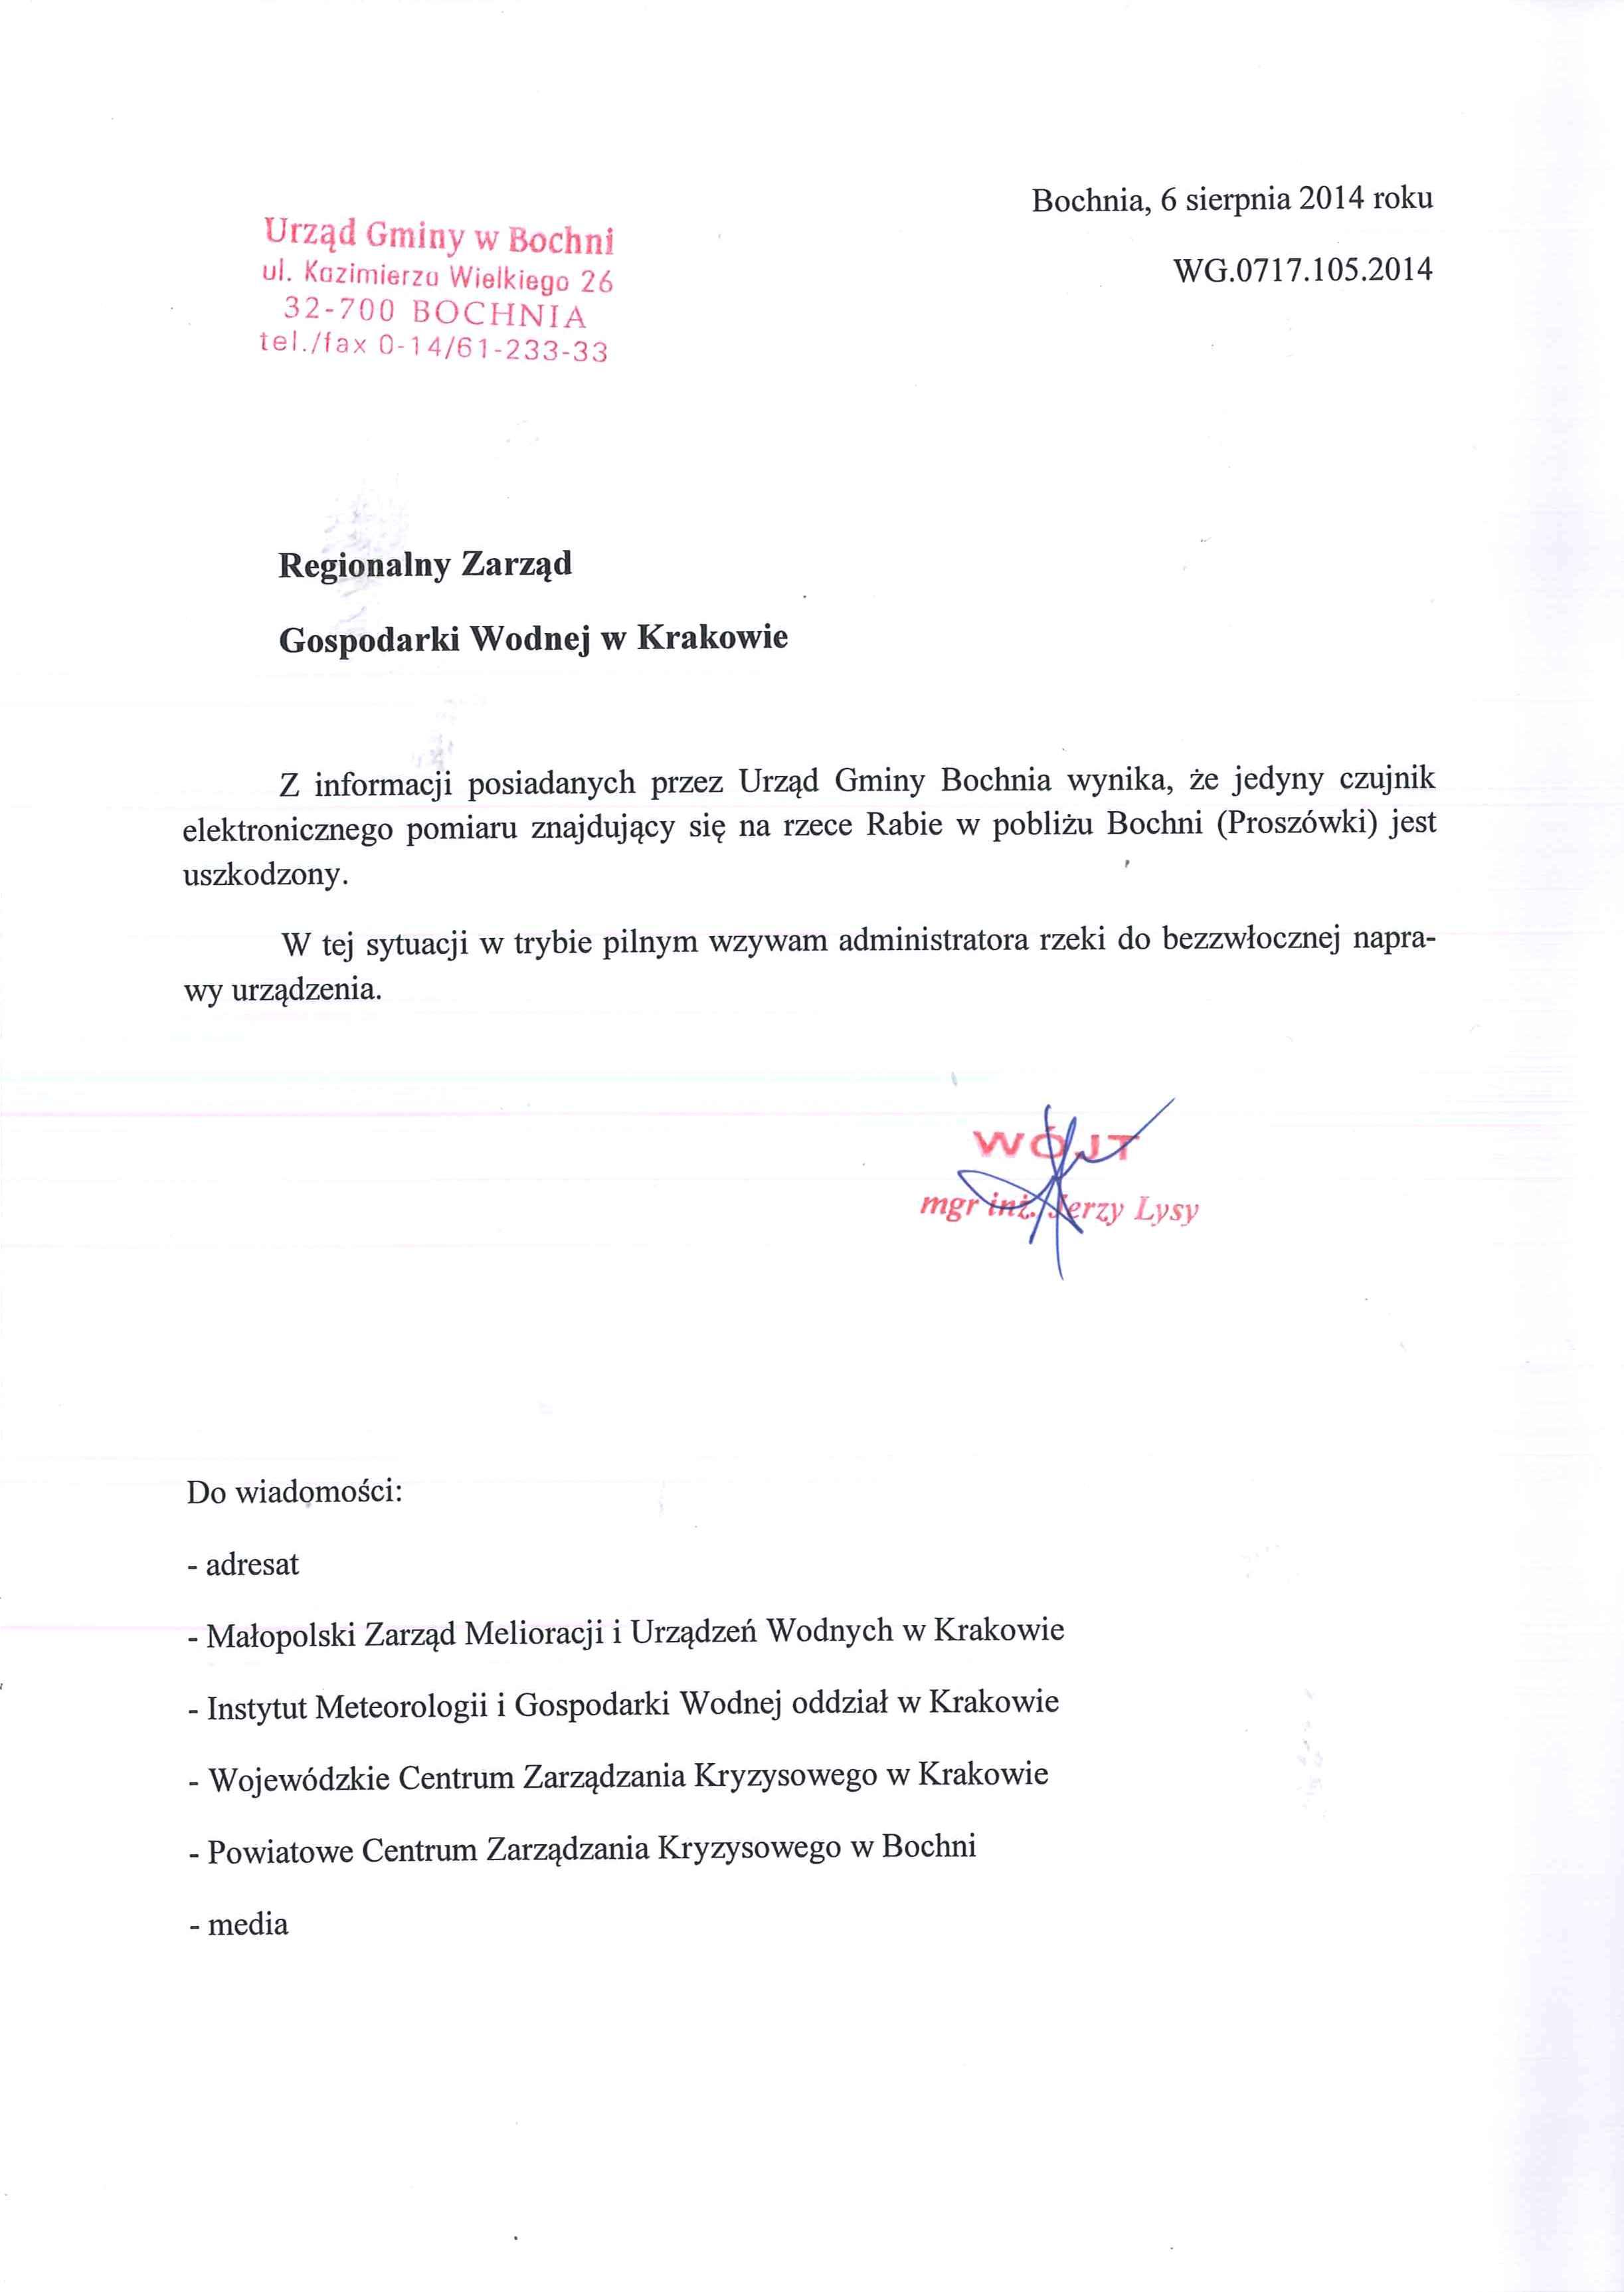 pismo doRZGW